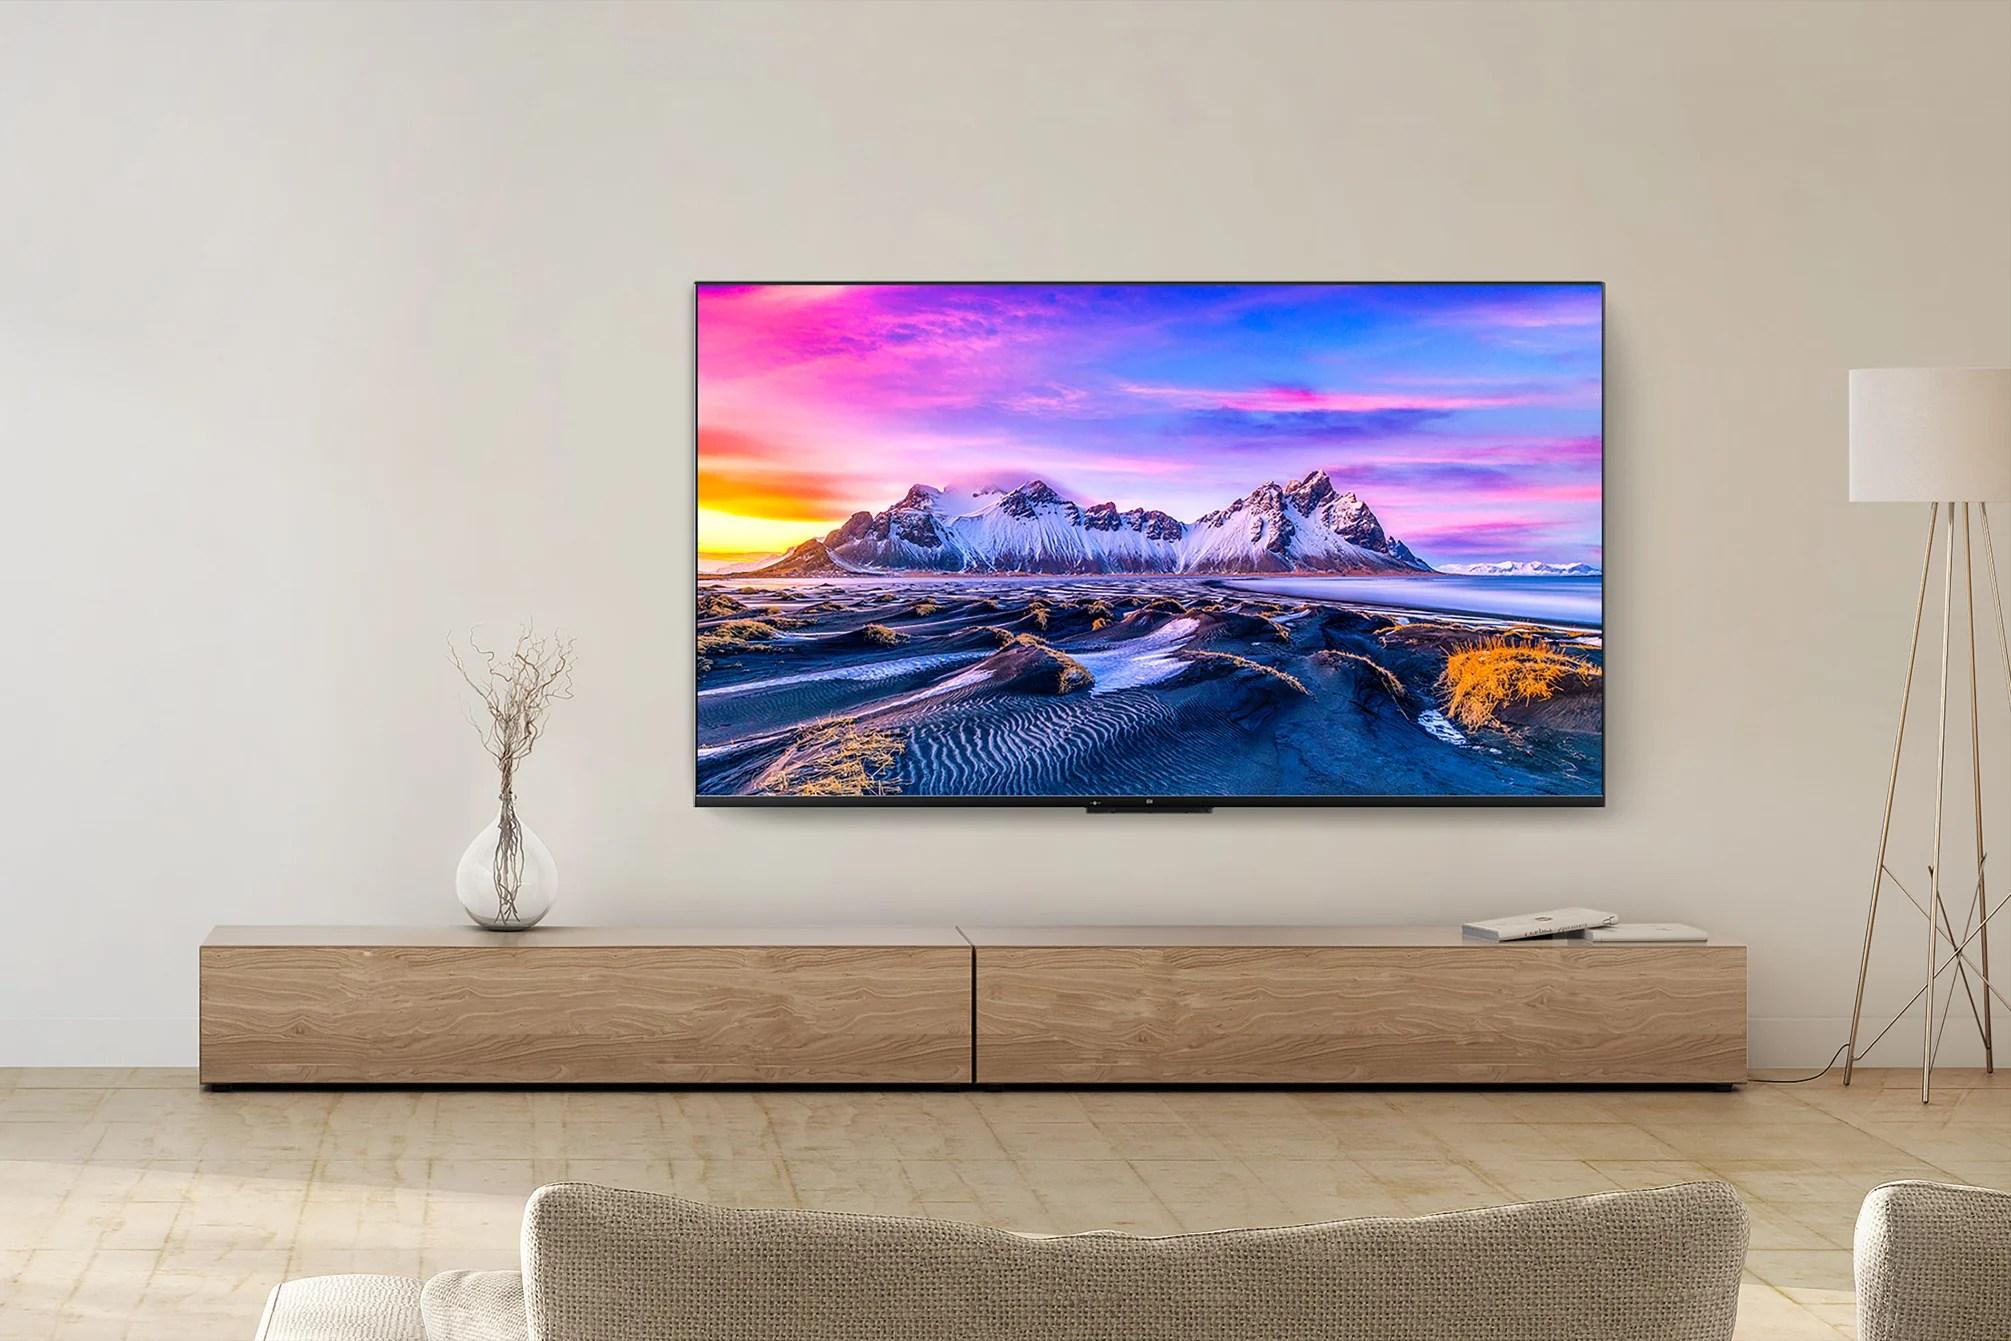 Xiaomi Mi TV P1 Series Launched: New Remote, HDMI 2.1, Dolby Vision, & More - Gizmochina